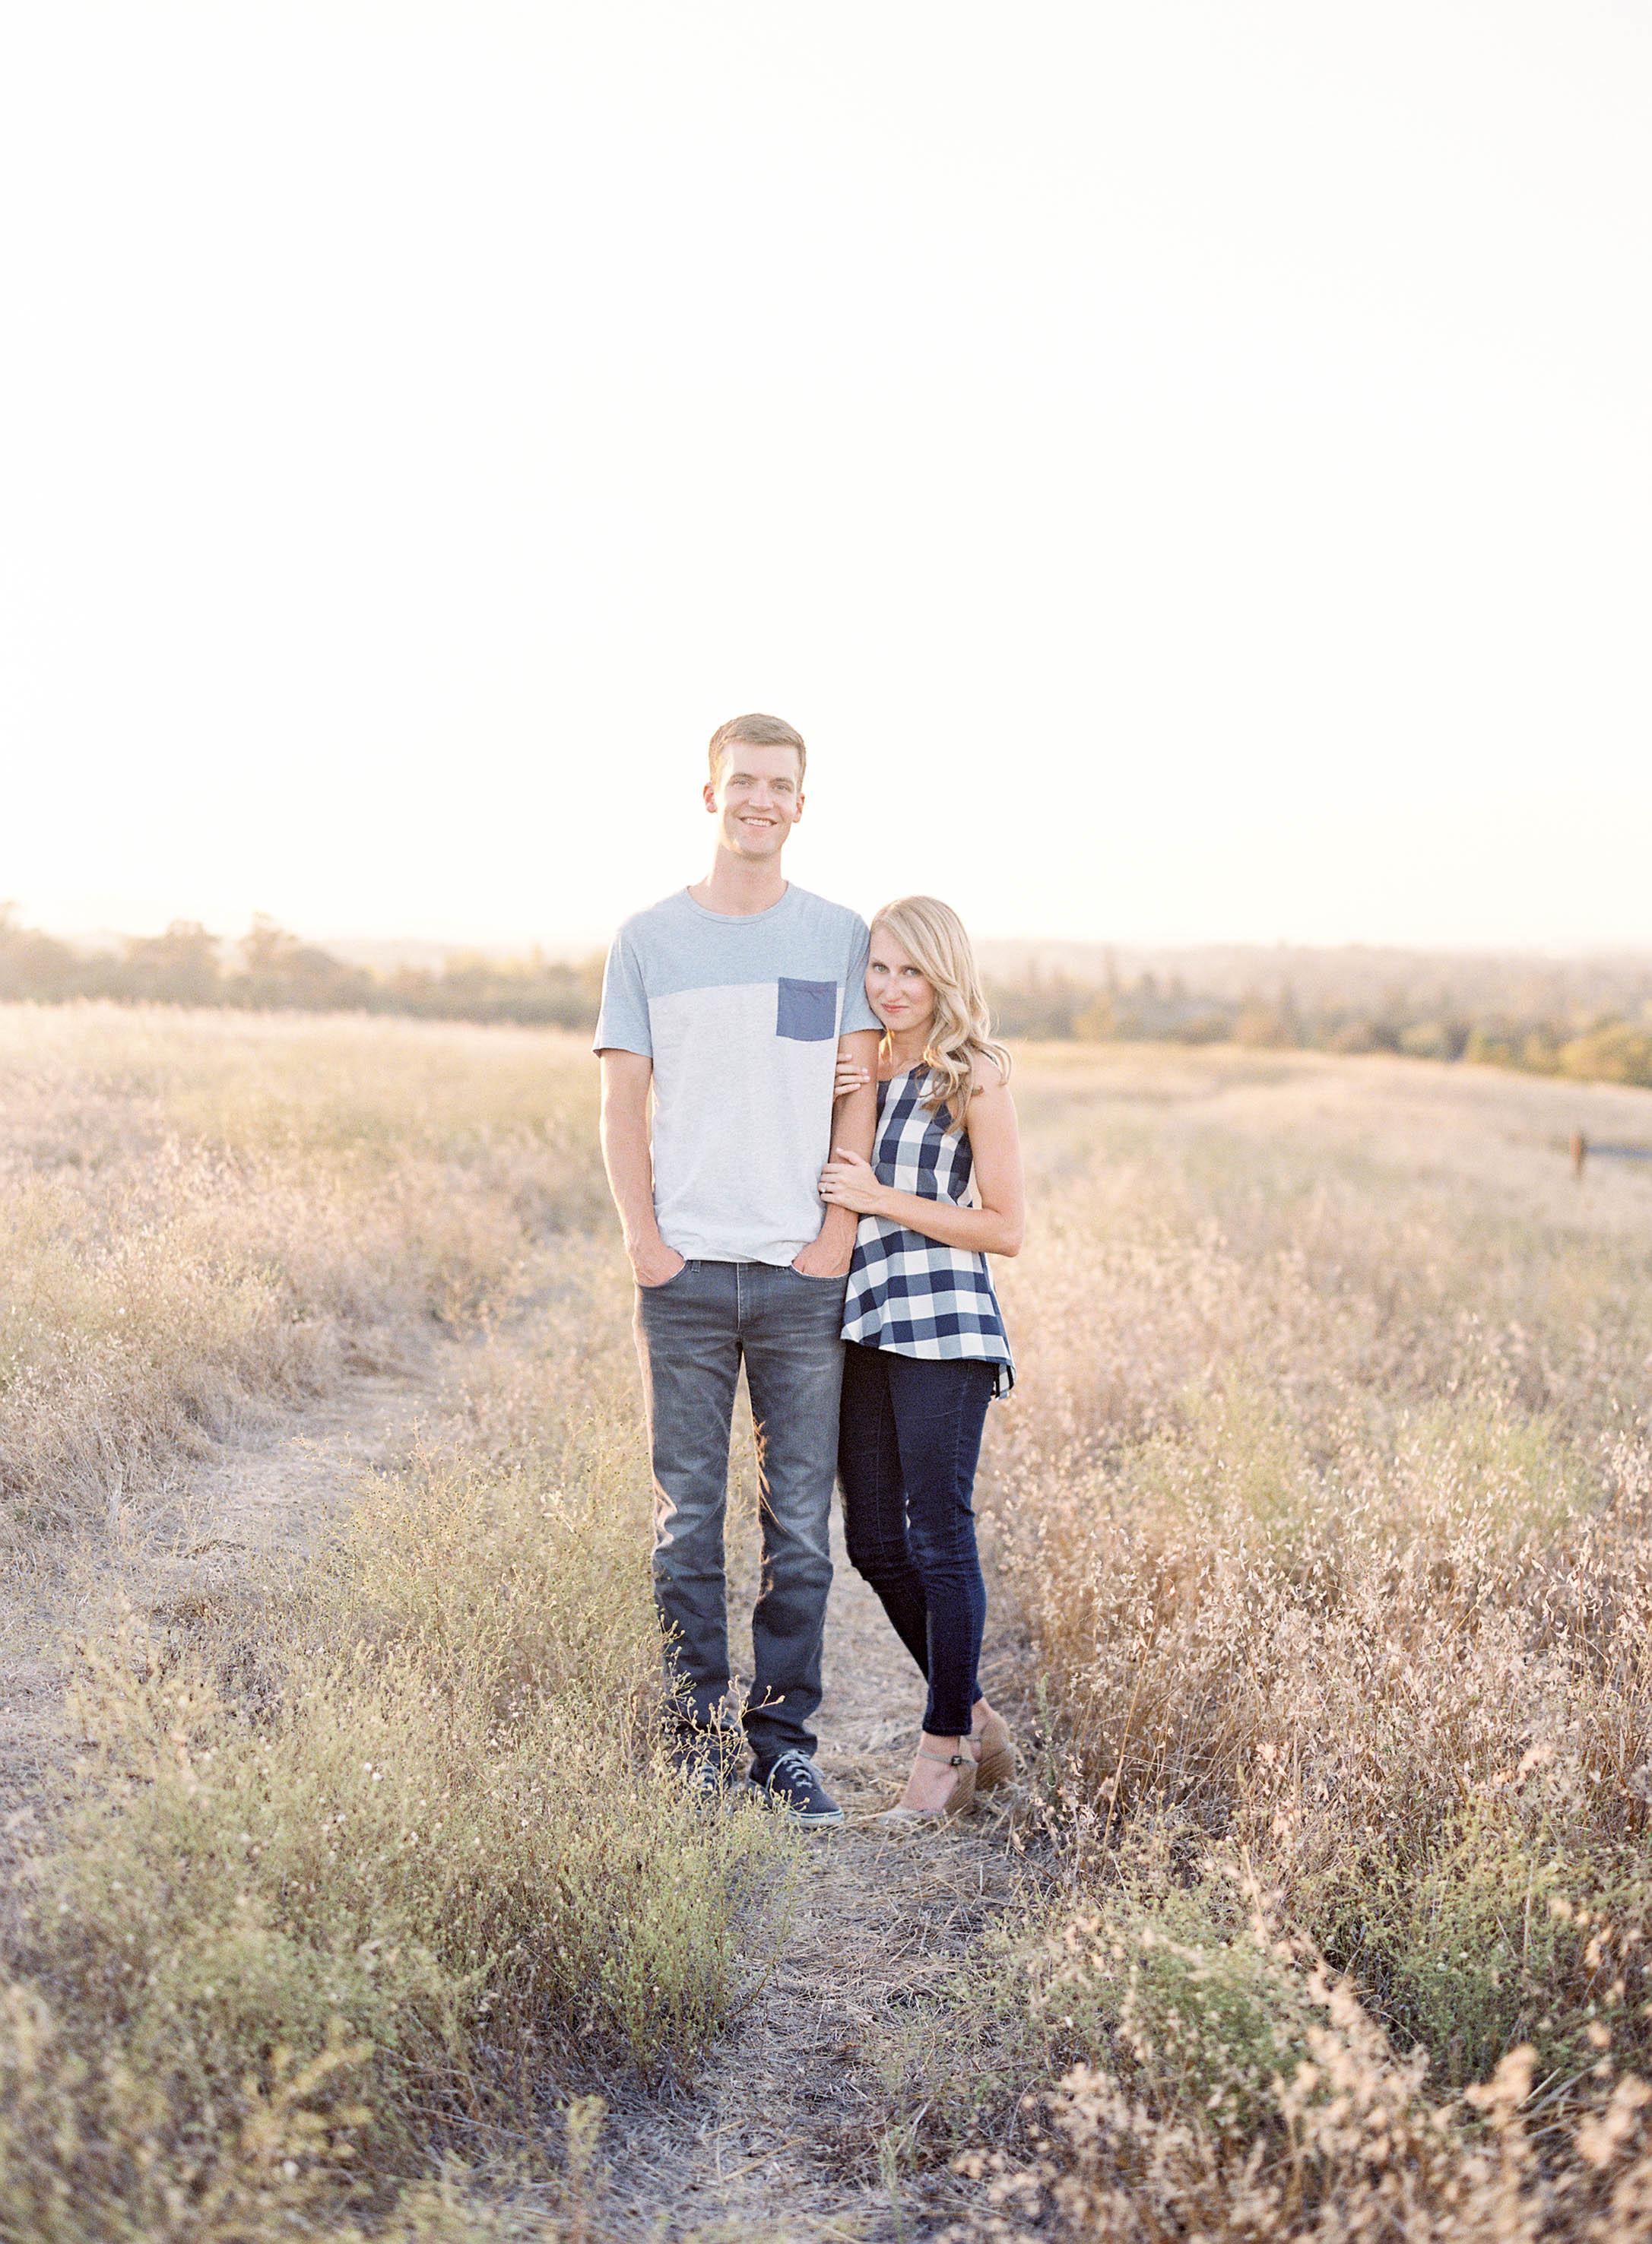 Meghan Mehan Photography - Fine Art Film Wedding Photography - San Francisco   Napa   Sonoma   Big Sur   Chicago   Minneapolis   Milwaukee   Lake Geneva   Door County   Wisconsin 008.jpg